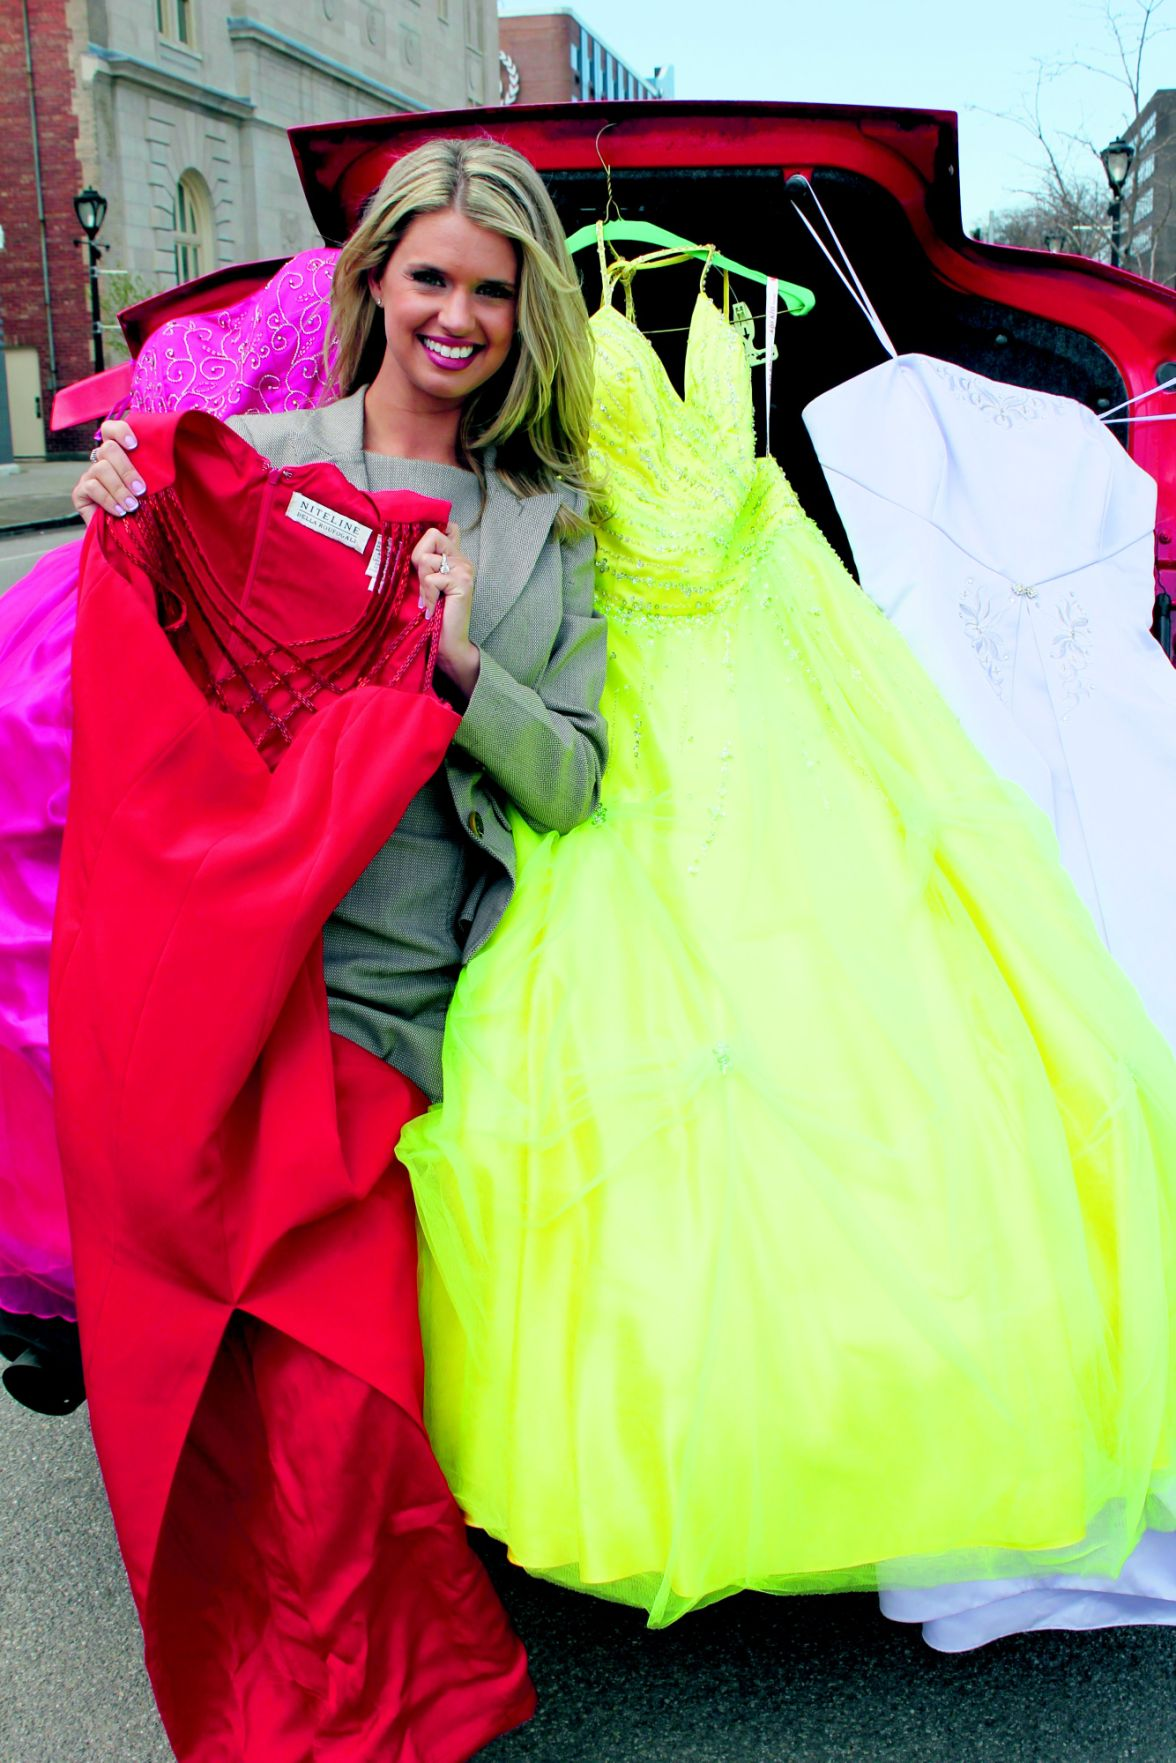 buy prom dresses in niagara area